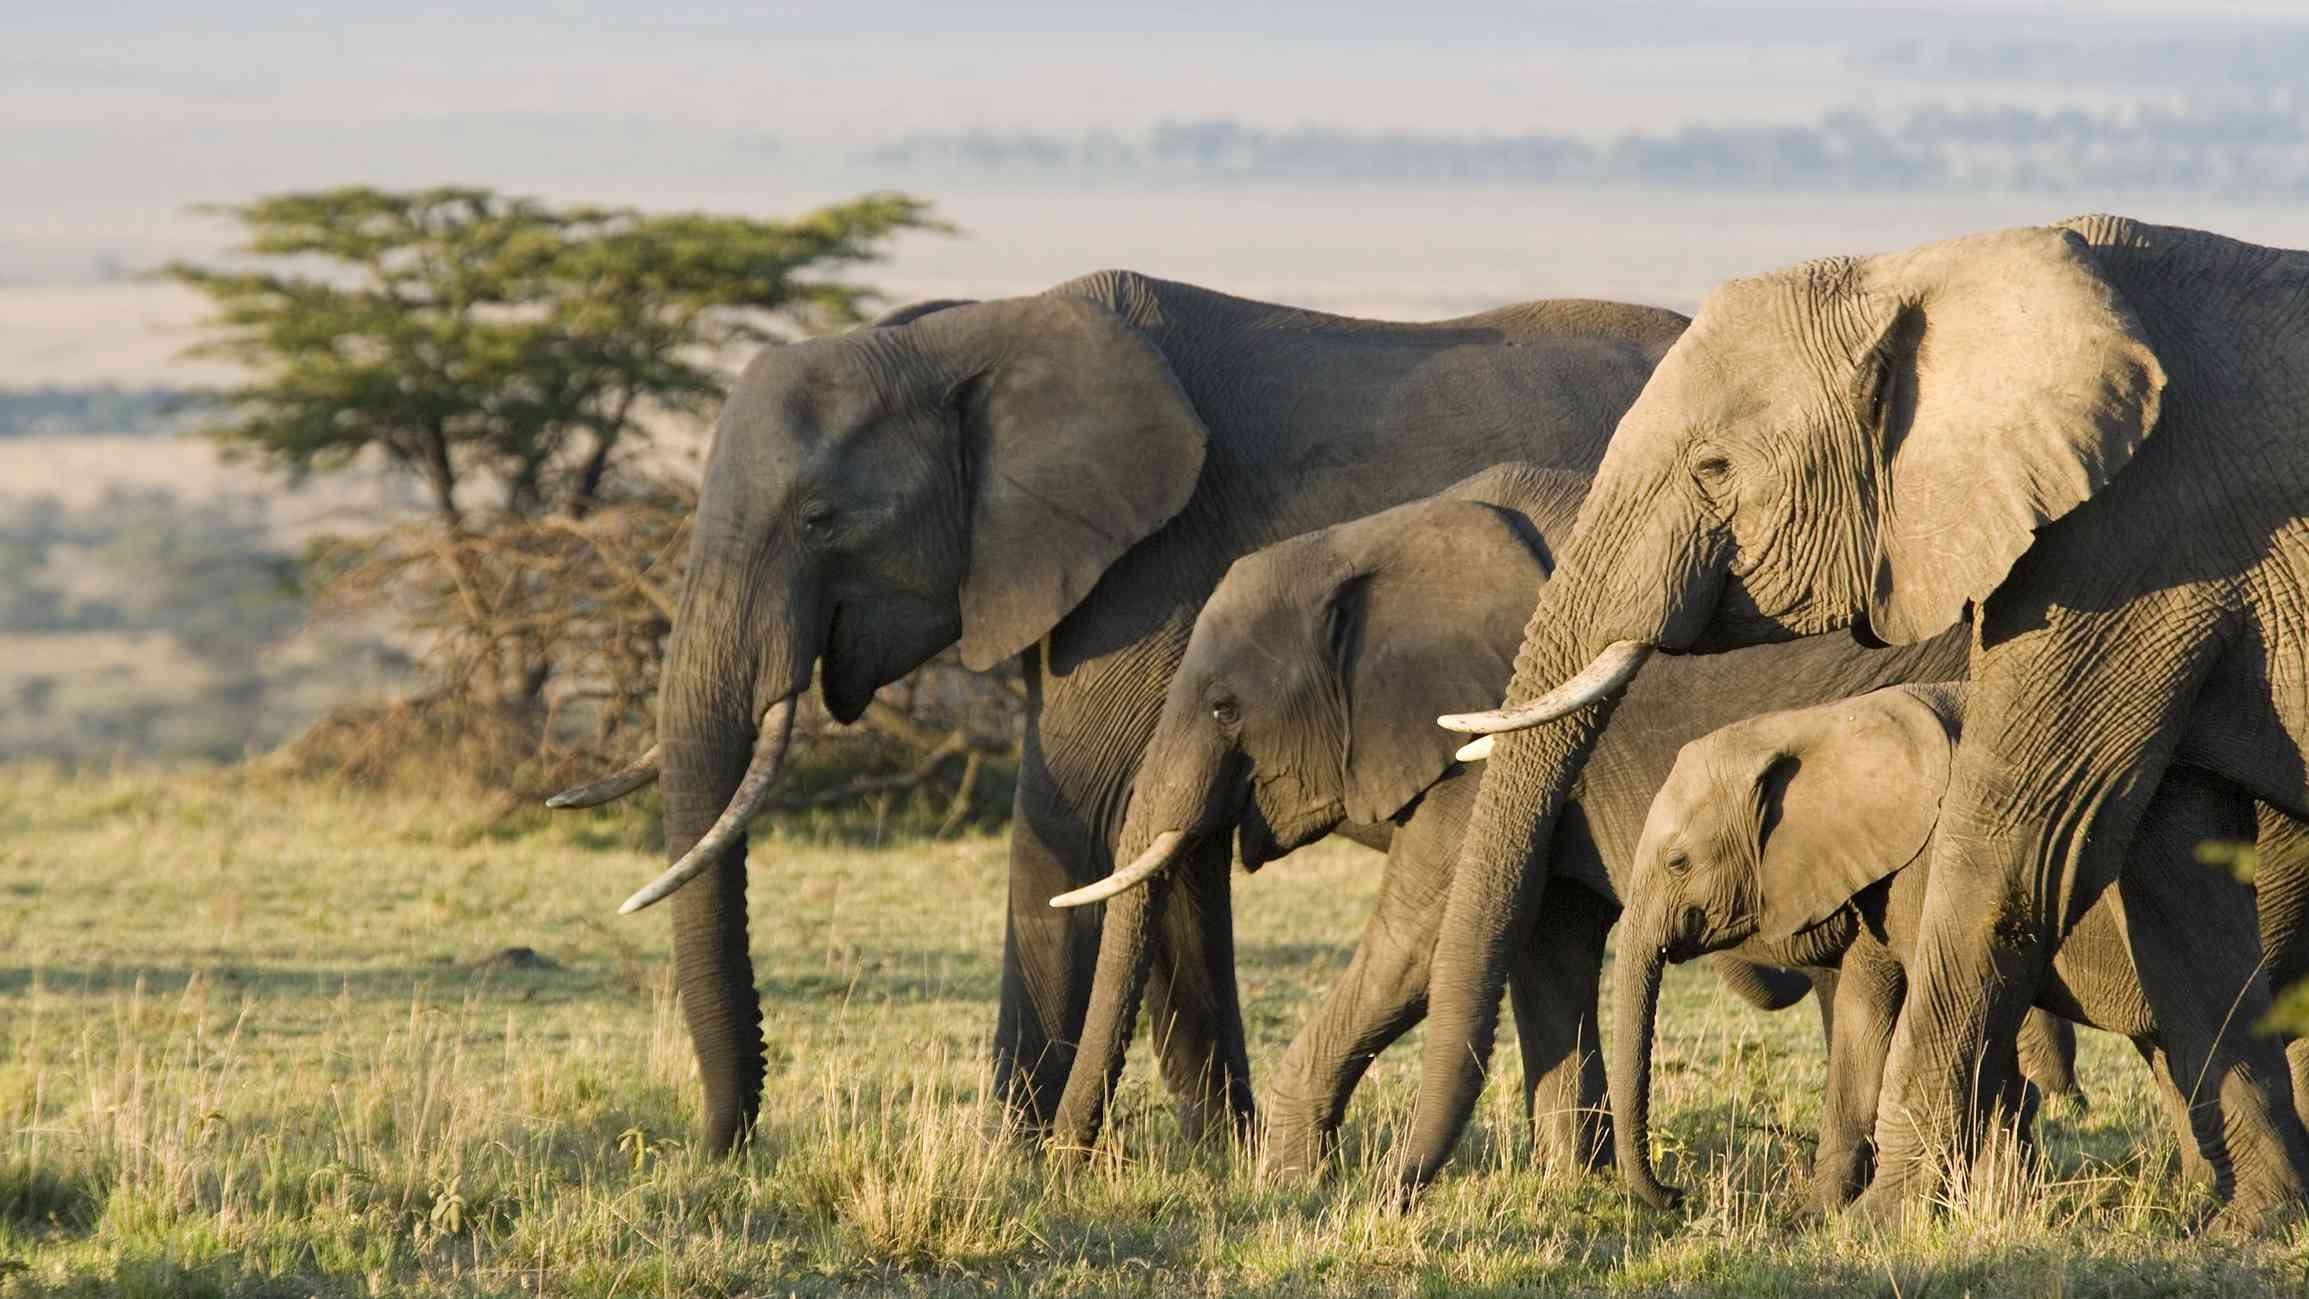 Group of African elephants walking